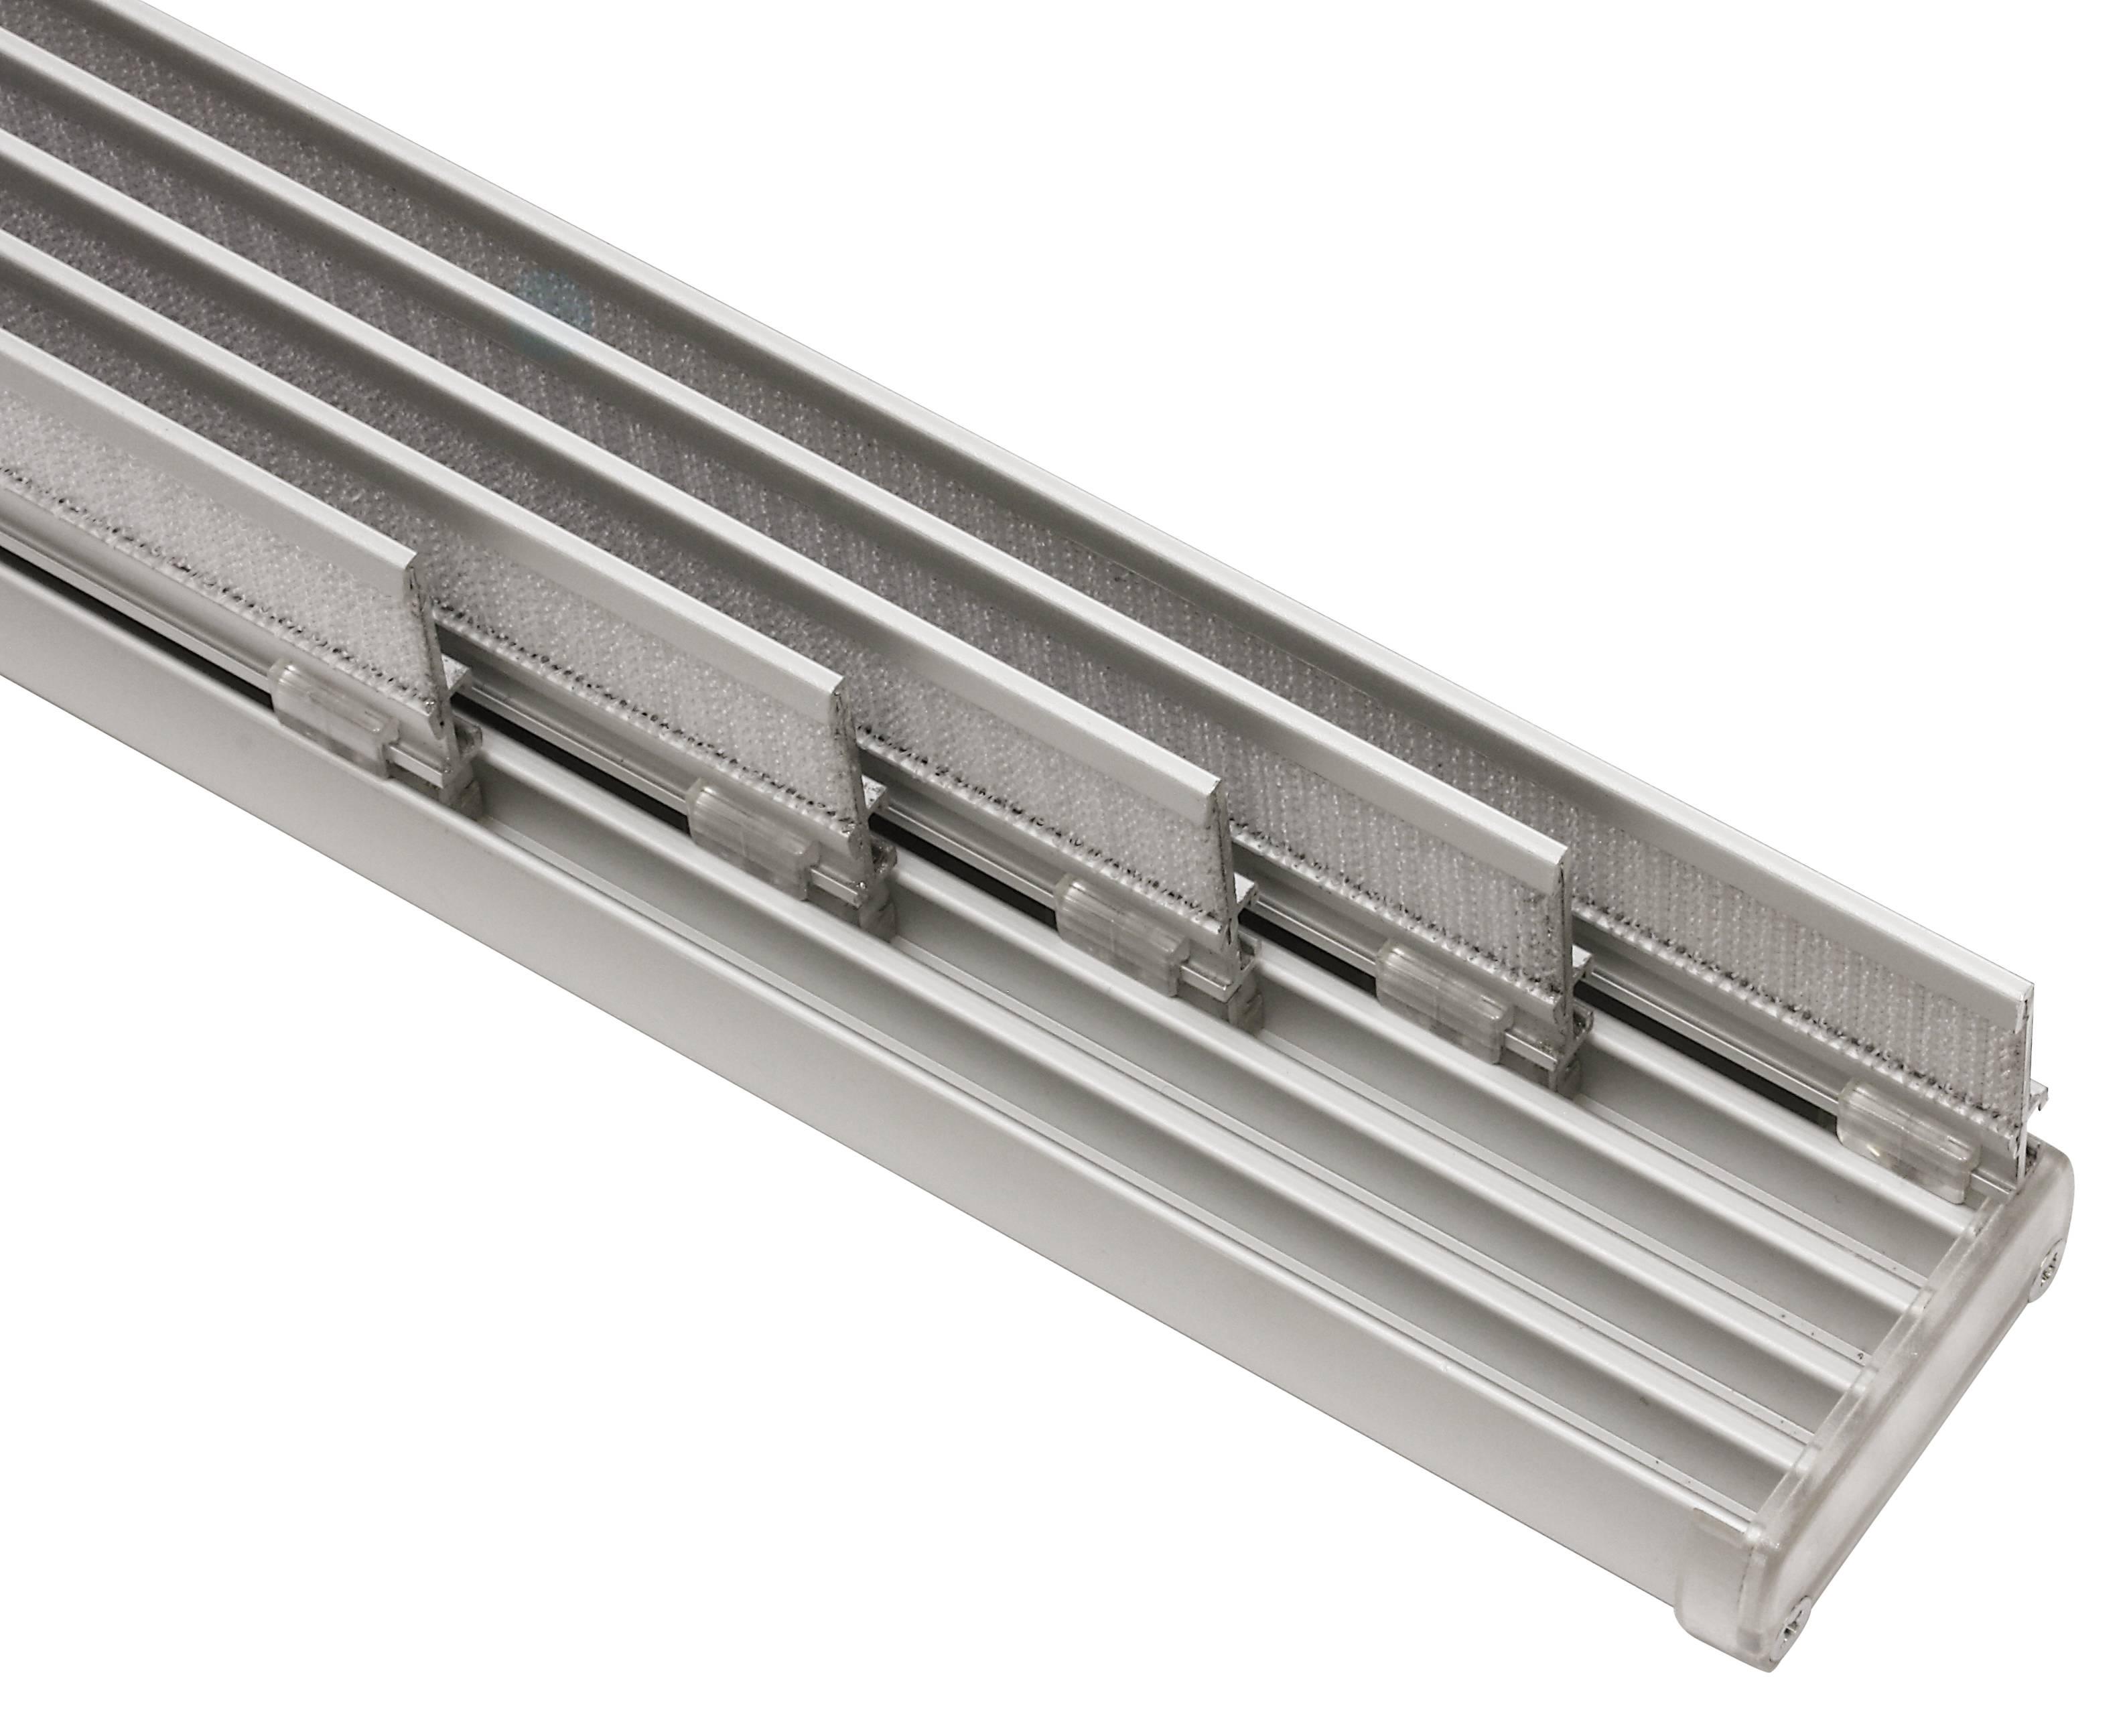 Häufig Flächenvorhangschiene Komfort 5-läufig aluminium 280 cm-31175 KK95